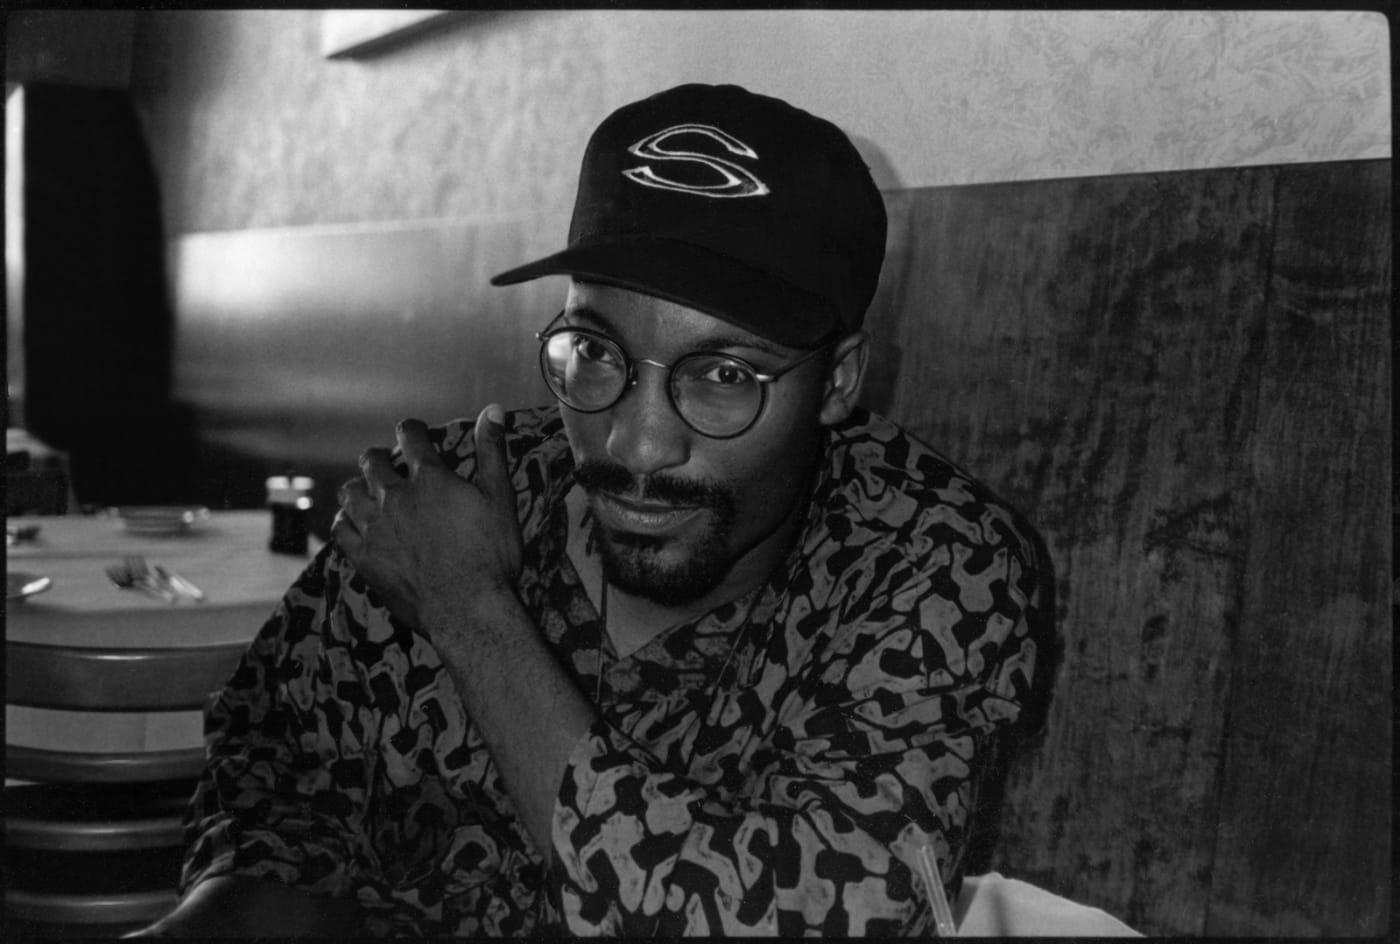 Portrait of John Singleton, Los Angeles, California, late 1980s or early 1990s